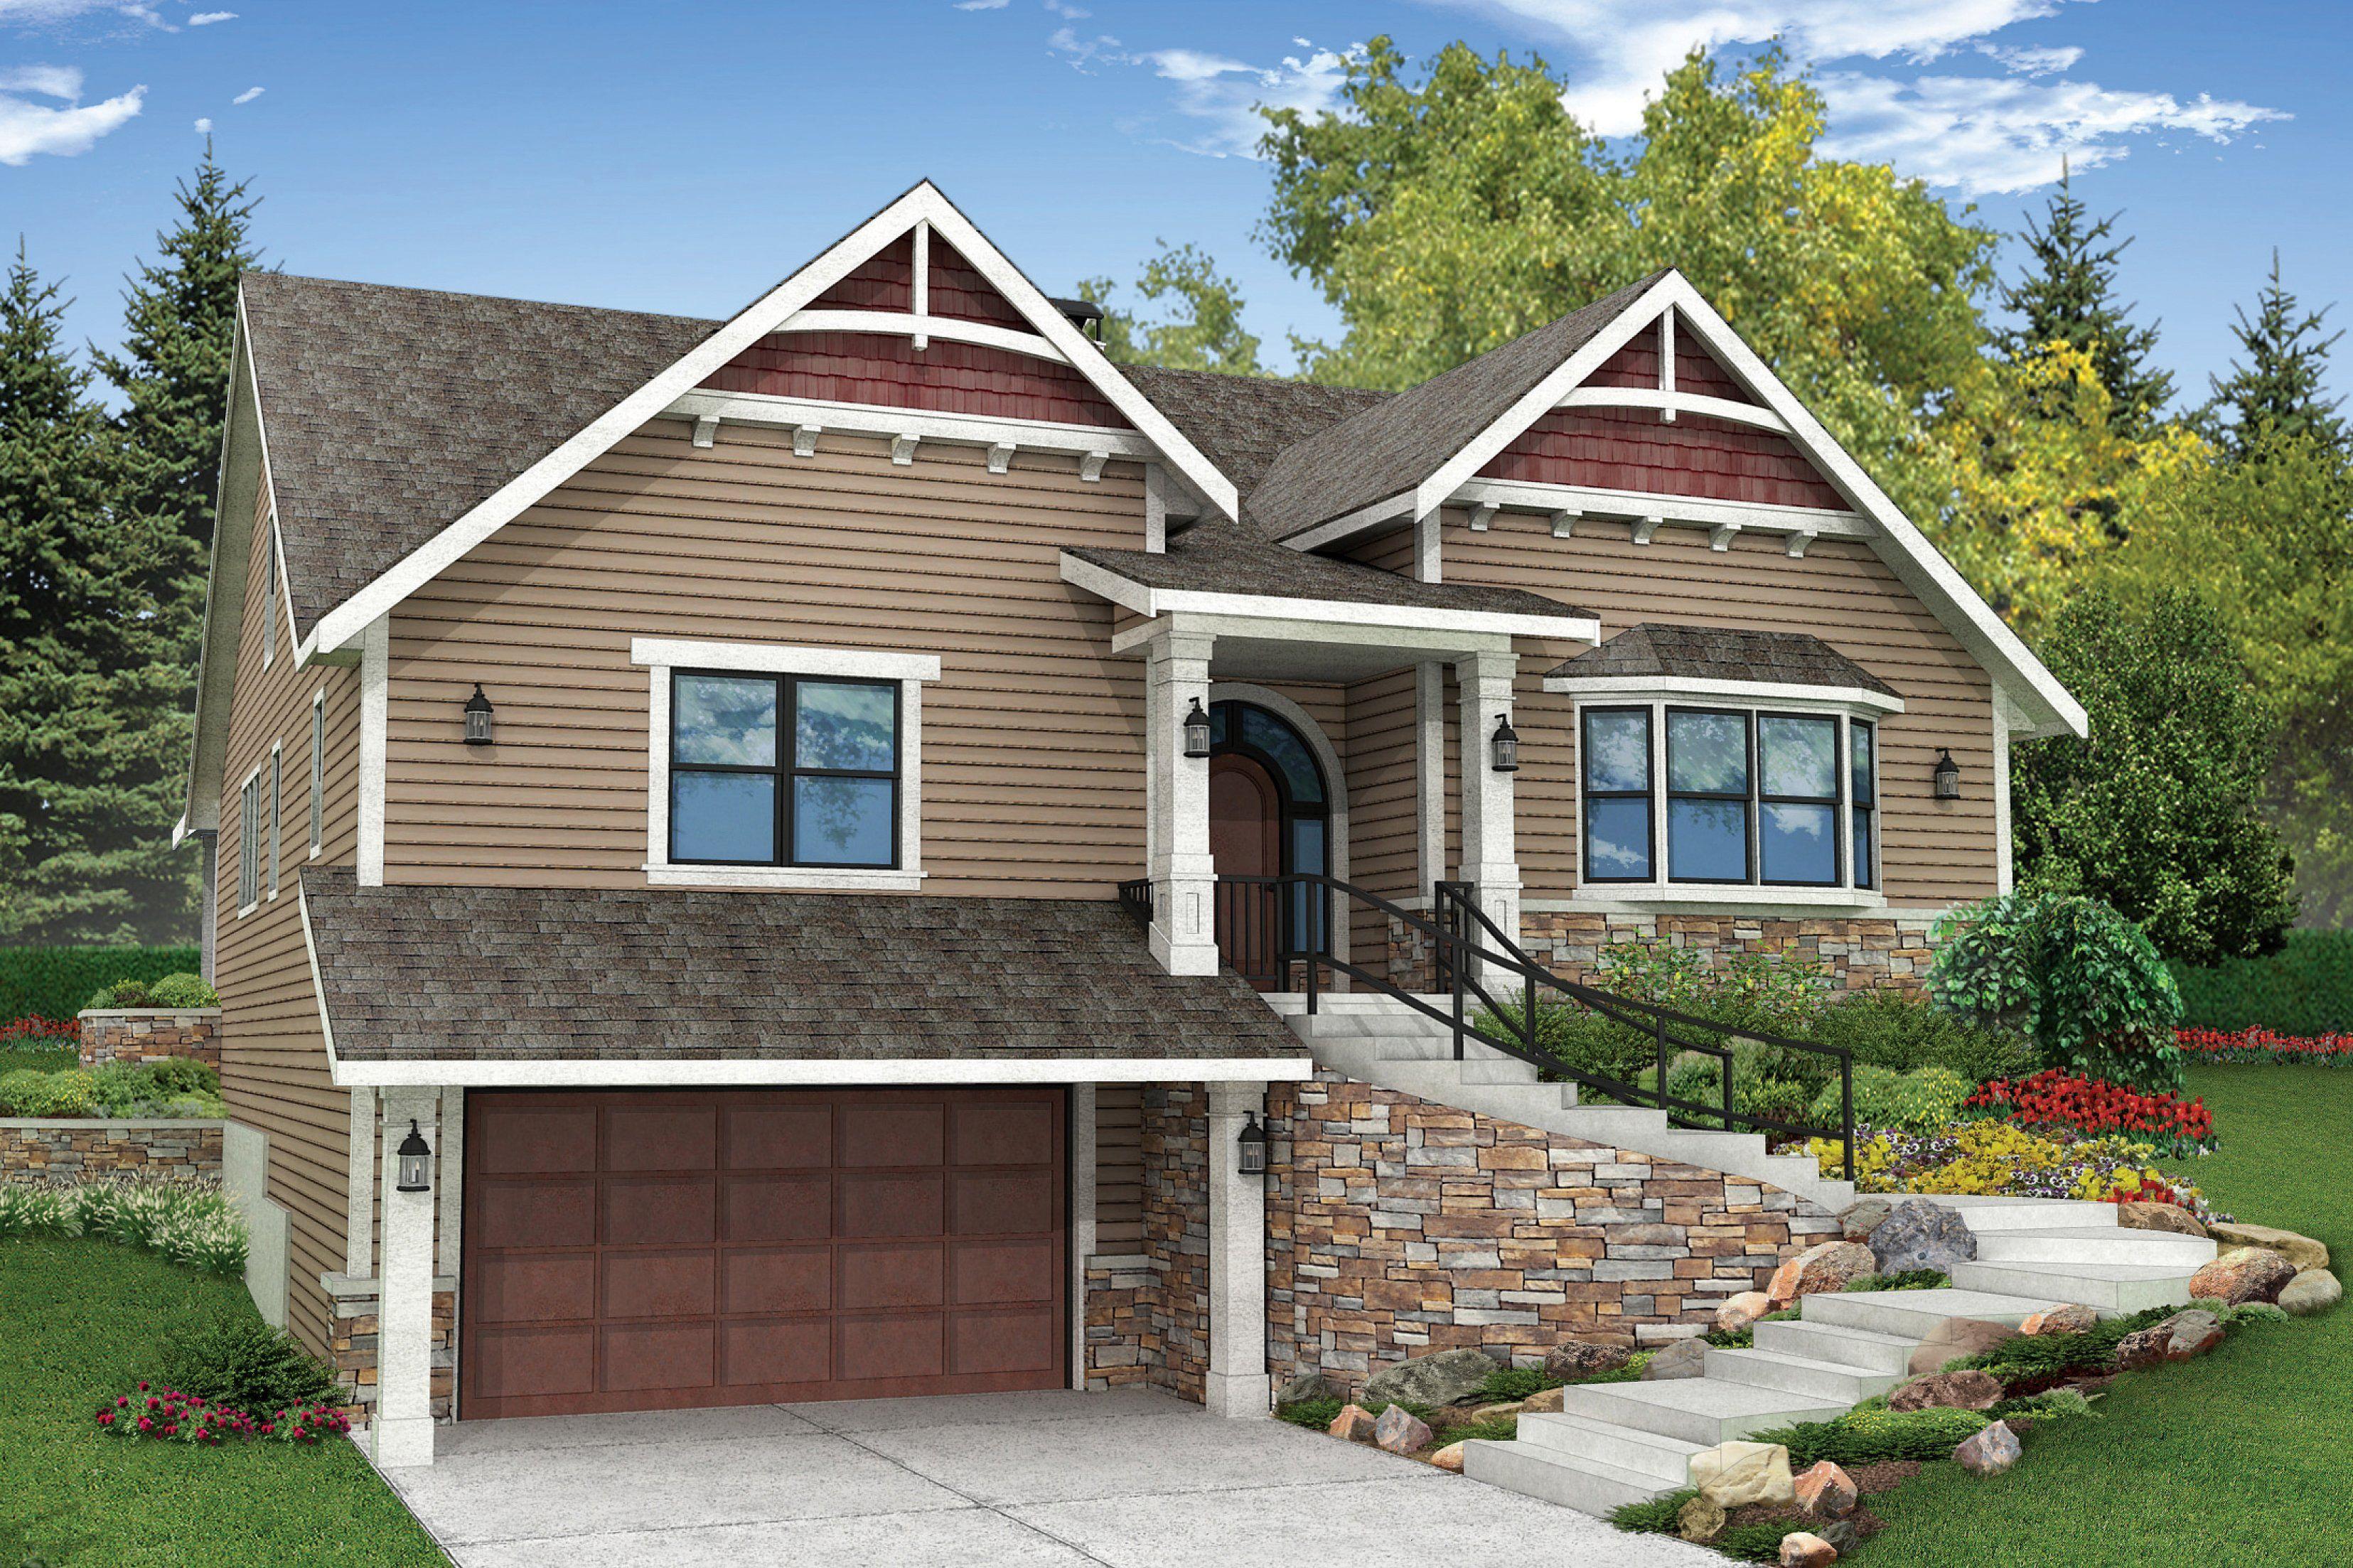 e6b606c4b06e015243f27561ed5477c0 house plans name sloping lot or hillside home plans house plans,Home Plans Sloped Lot